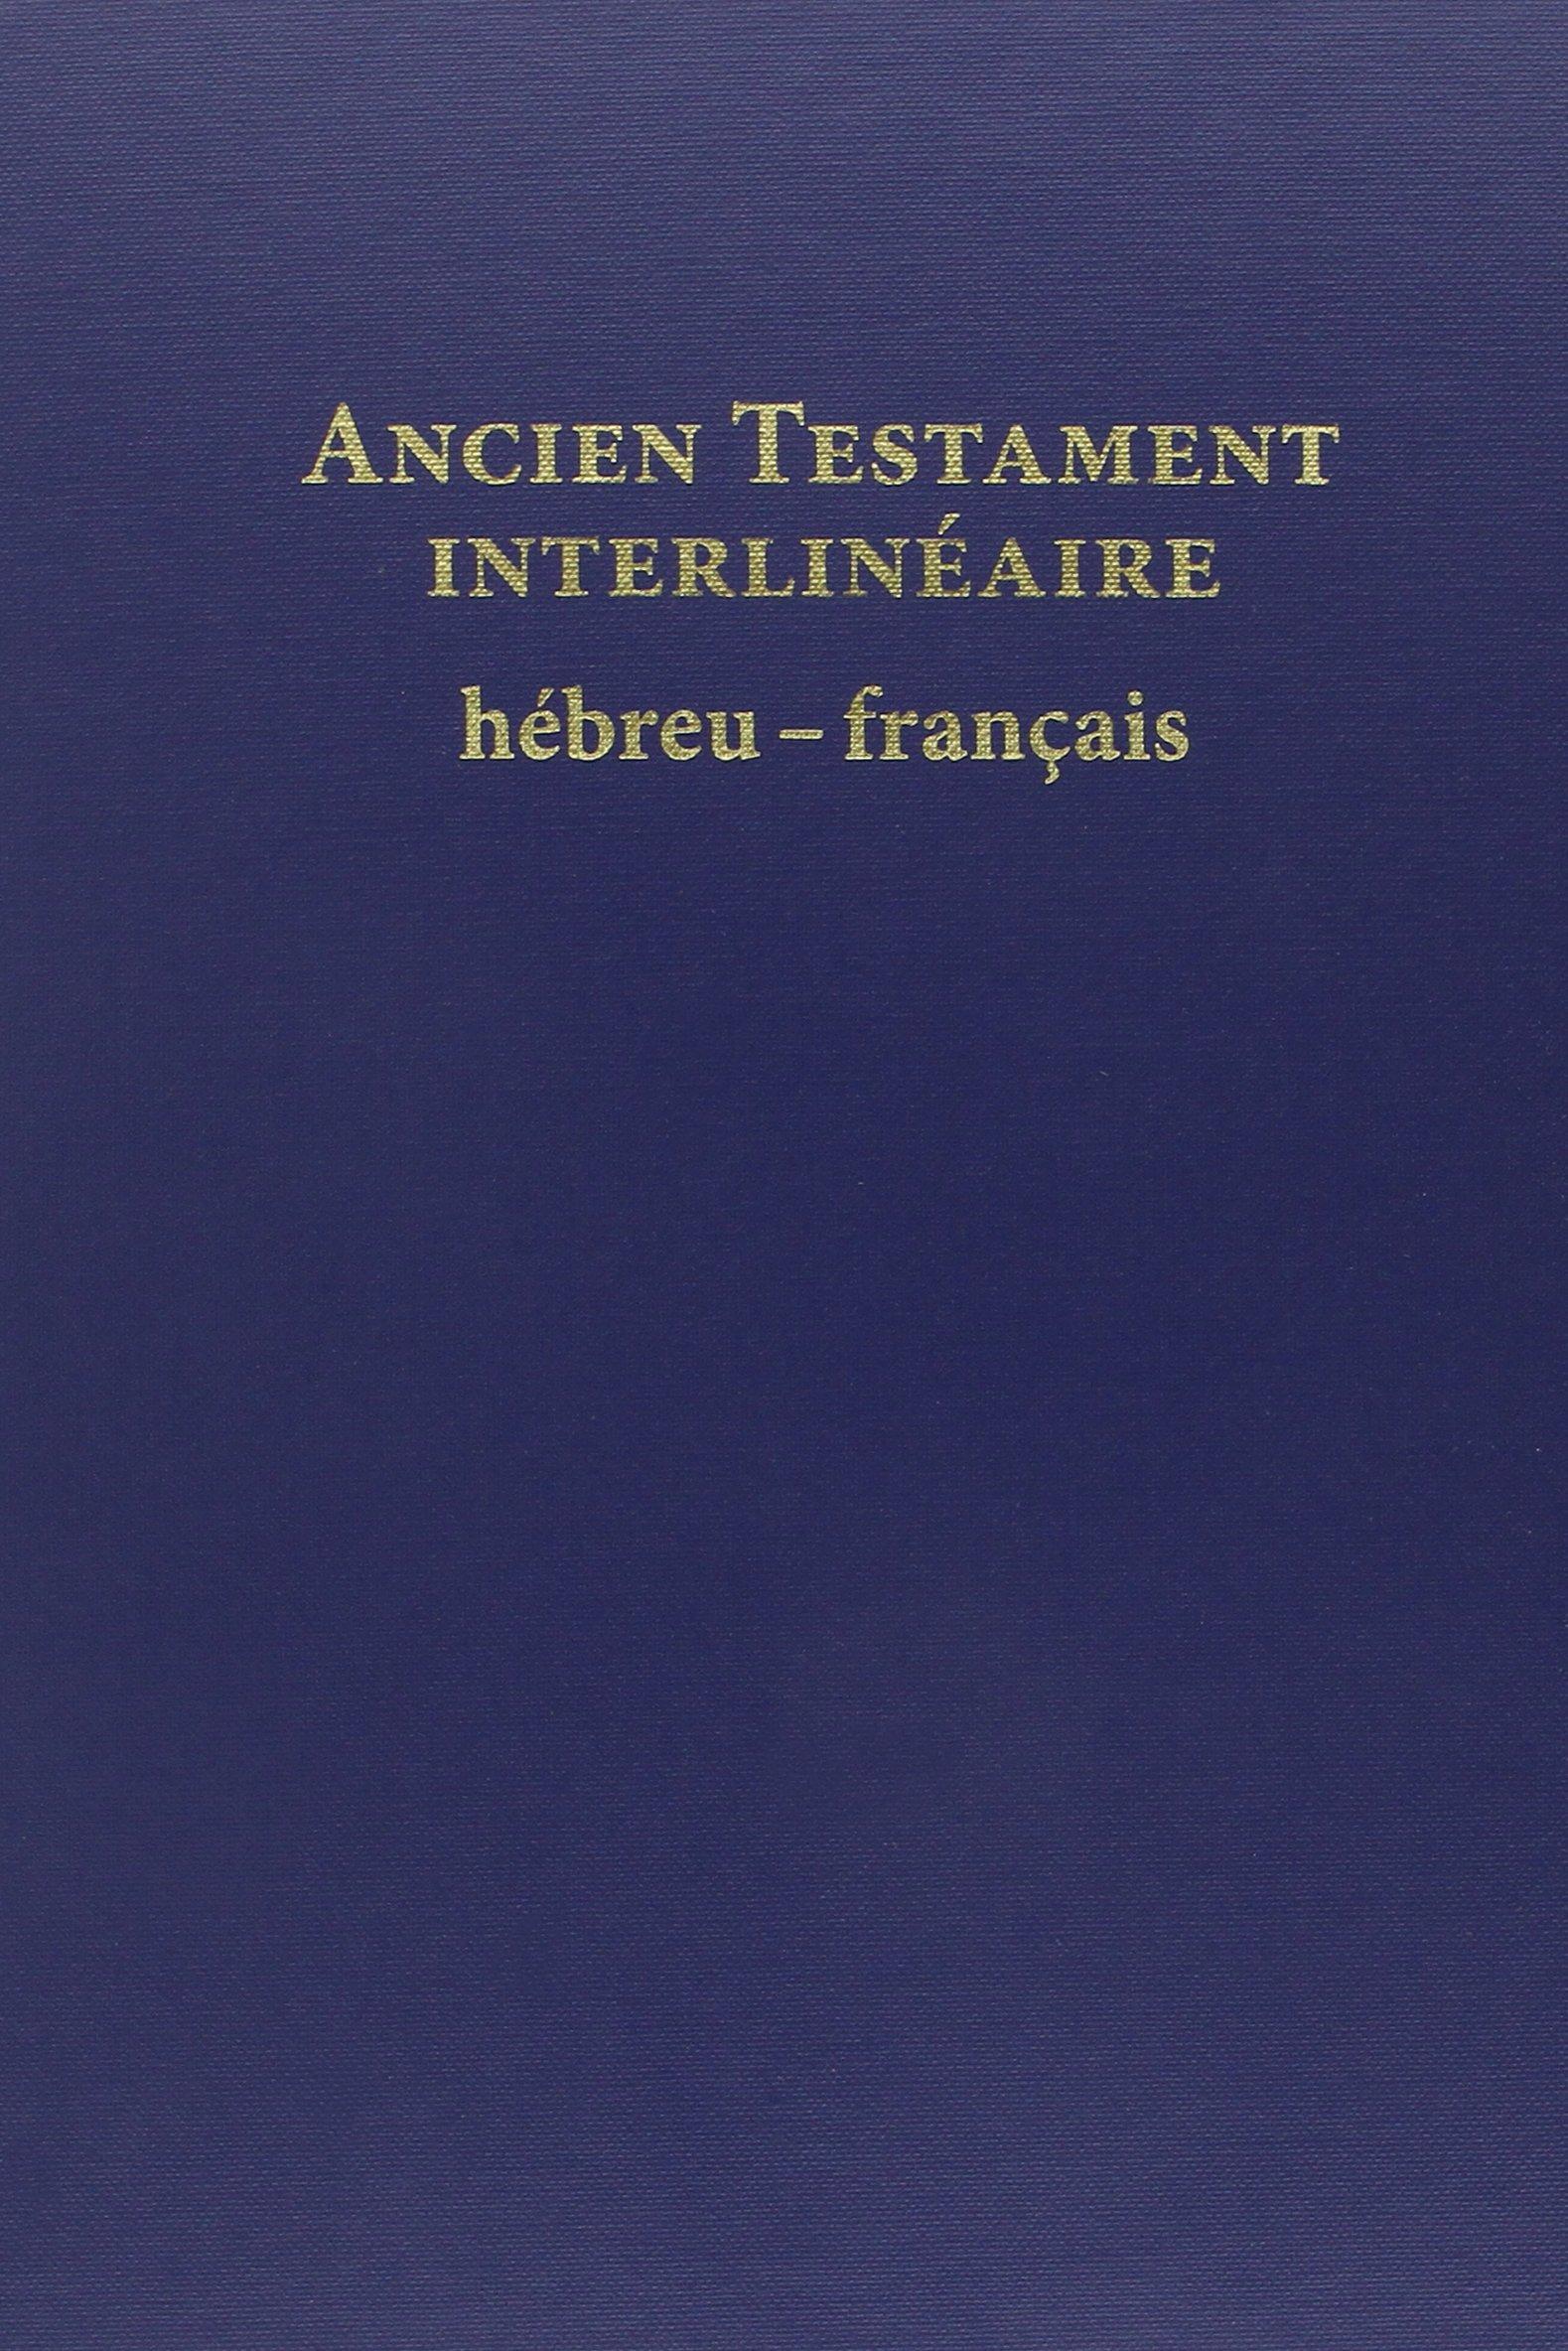 Ancien testament interlinéaire : hébreu-français